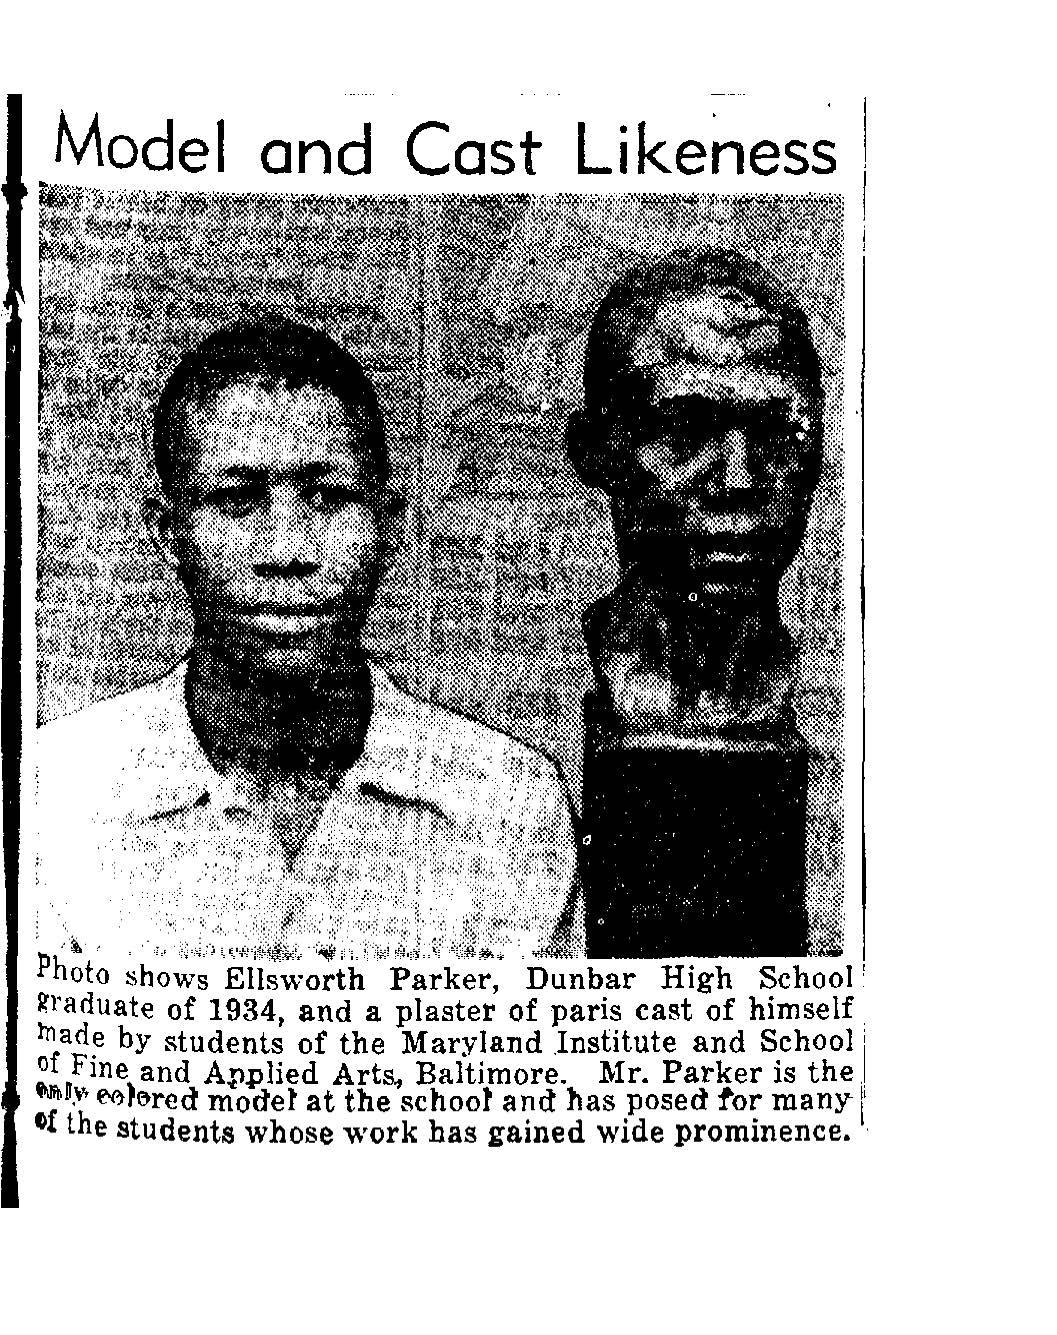 1940-6-29-Model_and_Cost_Likeness-2.jpg